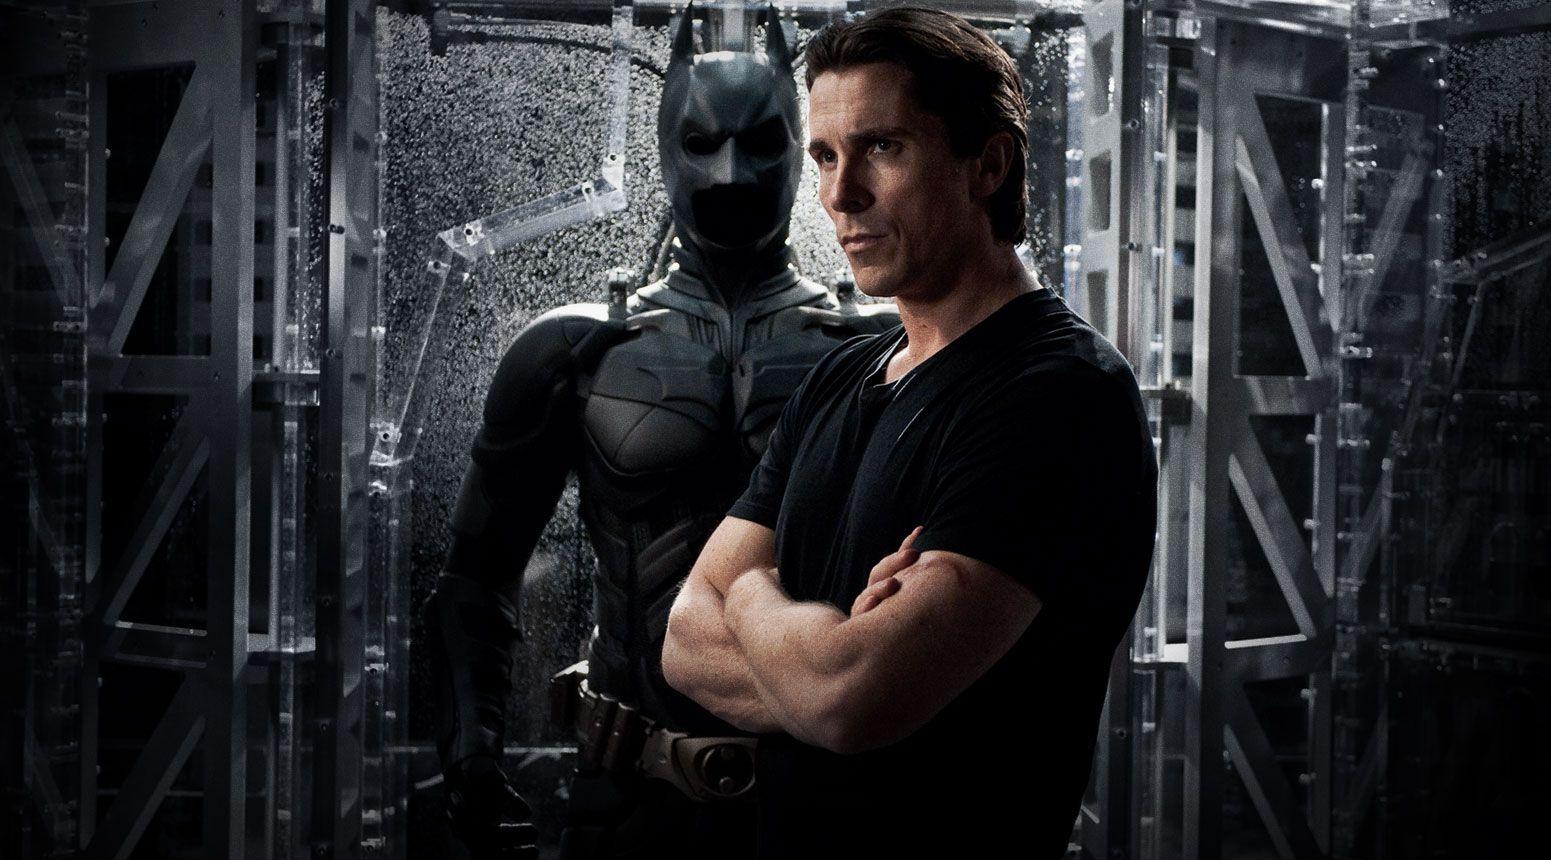 The Dark Knight Rises Review The Dark Knight Rises Christian